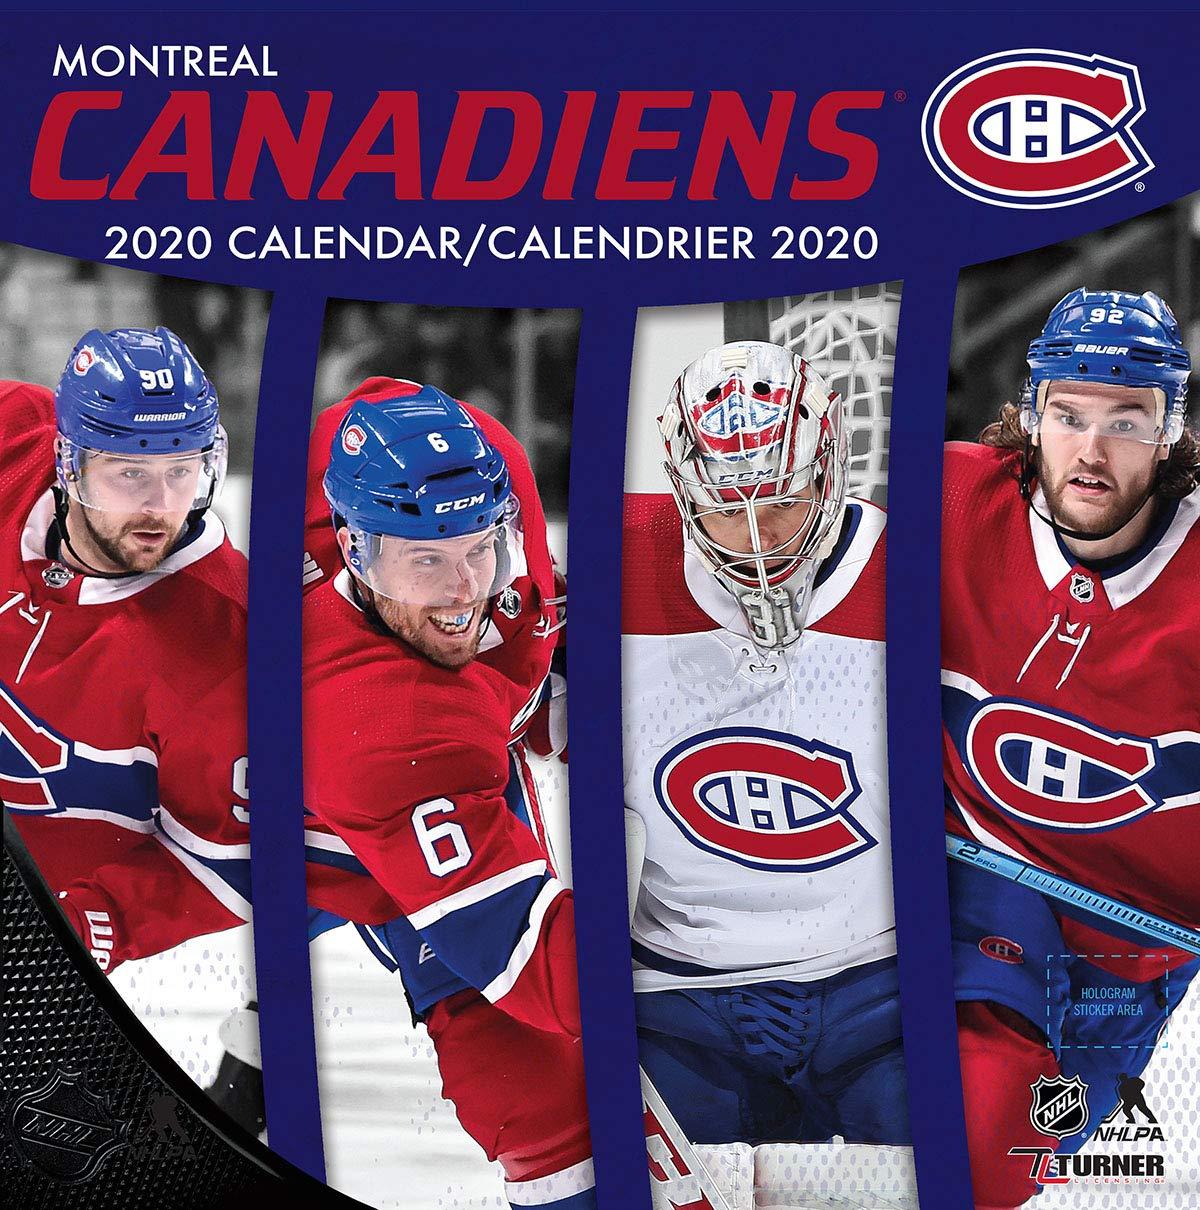 Montreal Canadiens 2020 Calendar Calendrier 2020 Lang Companies Inc 9781469369563 Books Amazon Ca